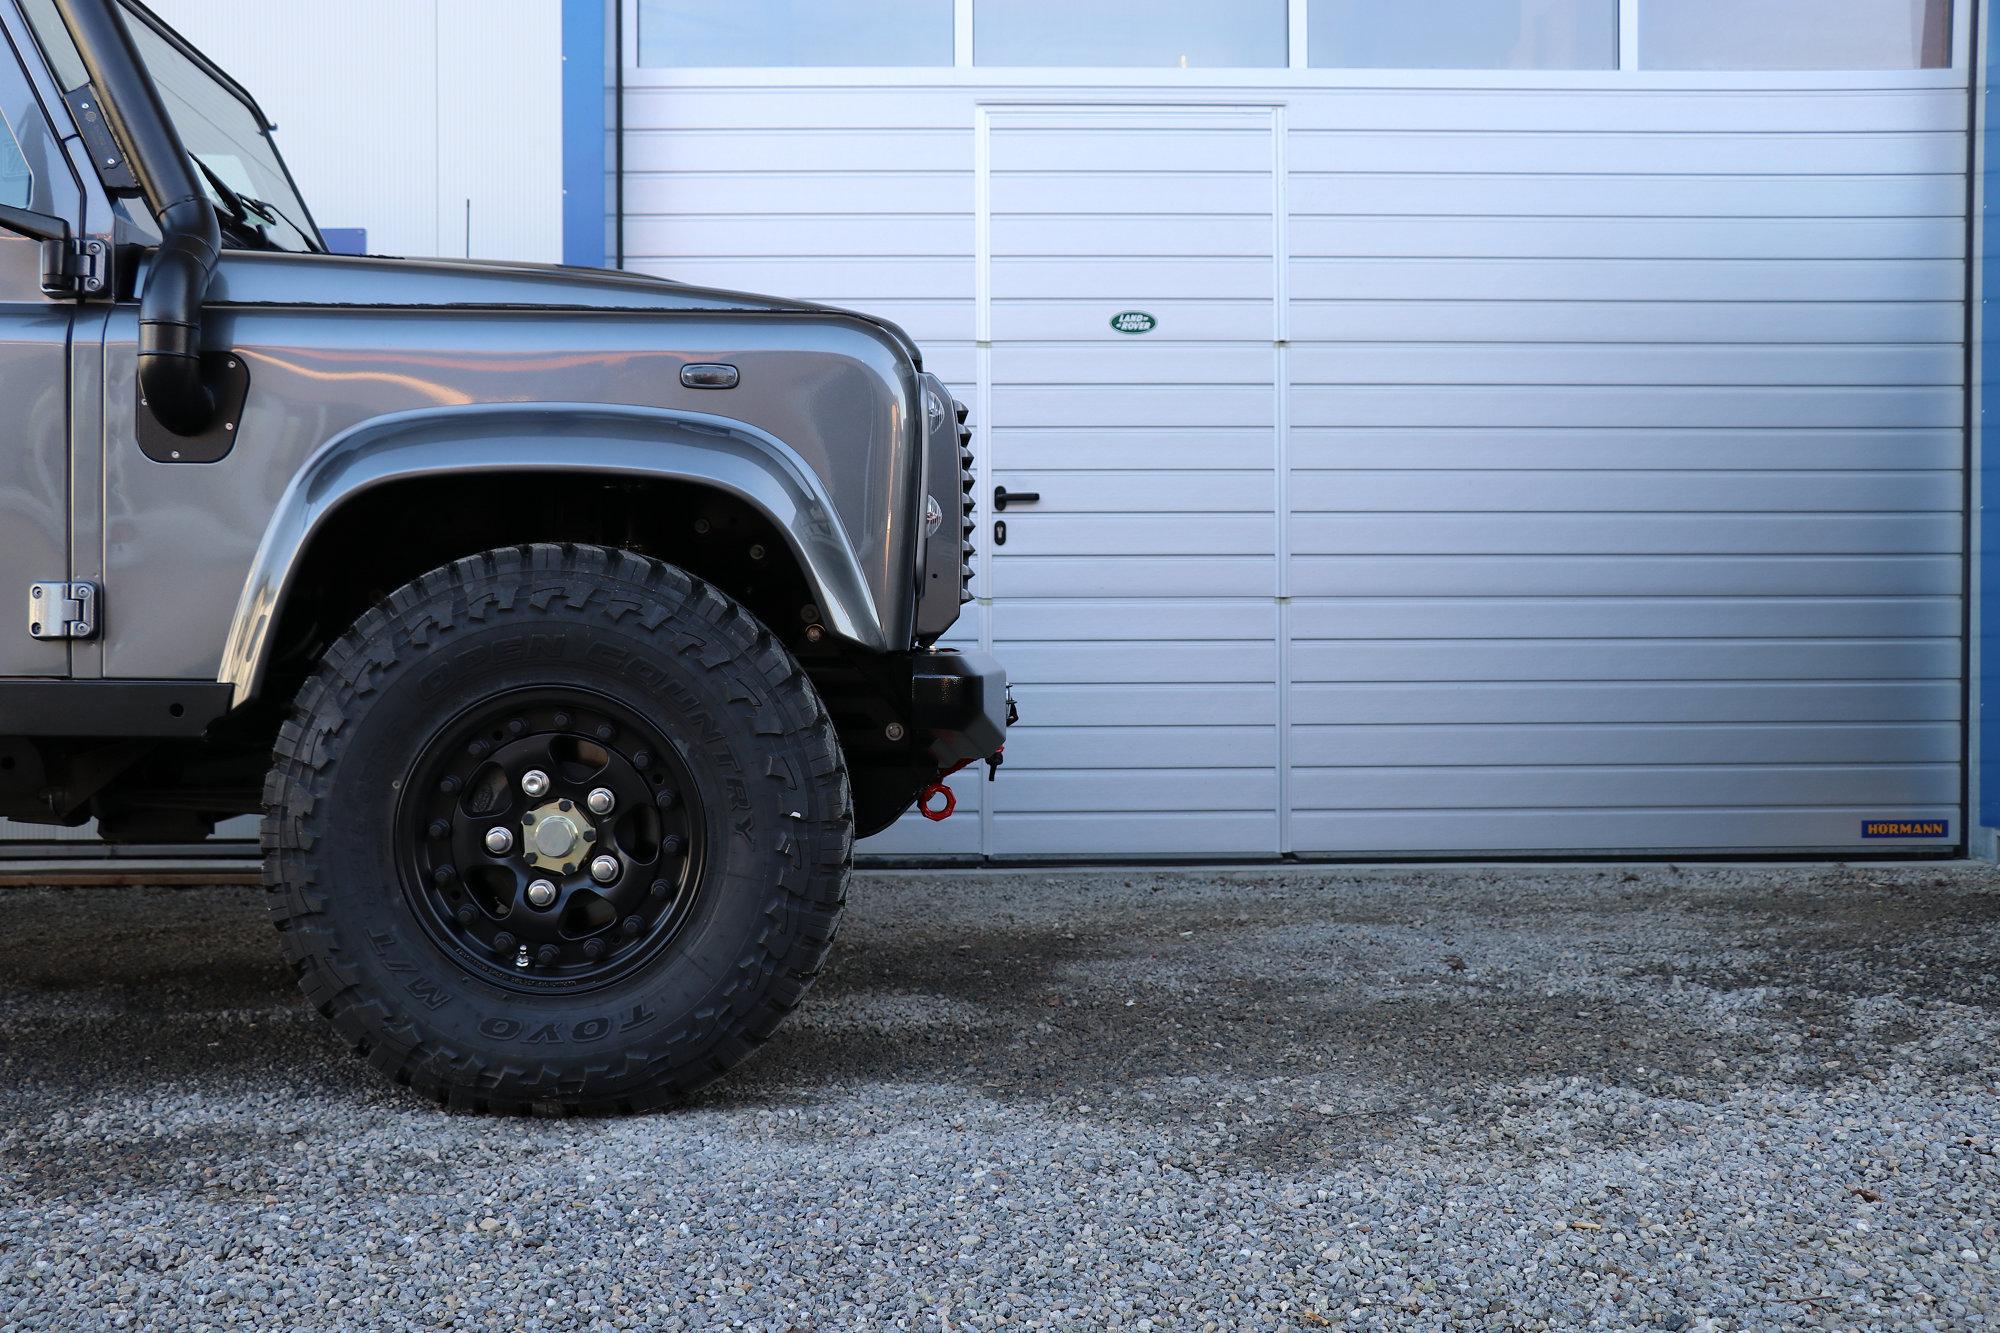 Seilwindenstossstange Land Rover Defender.004